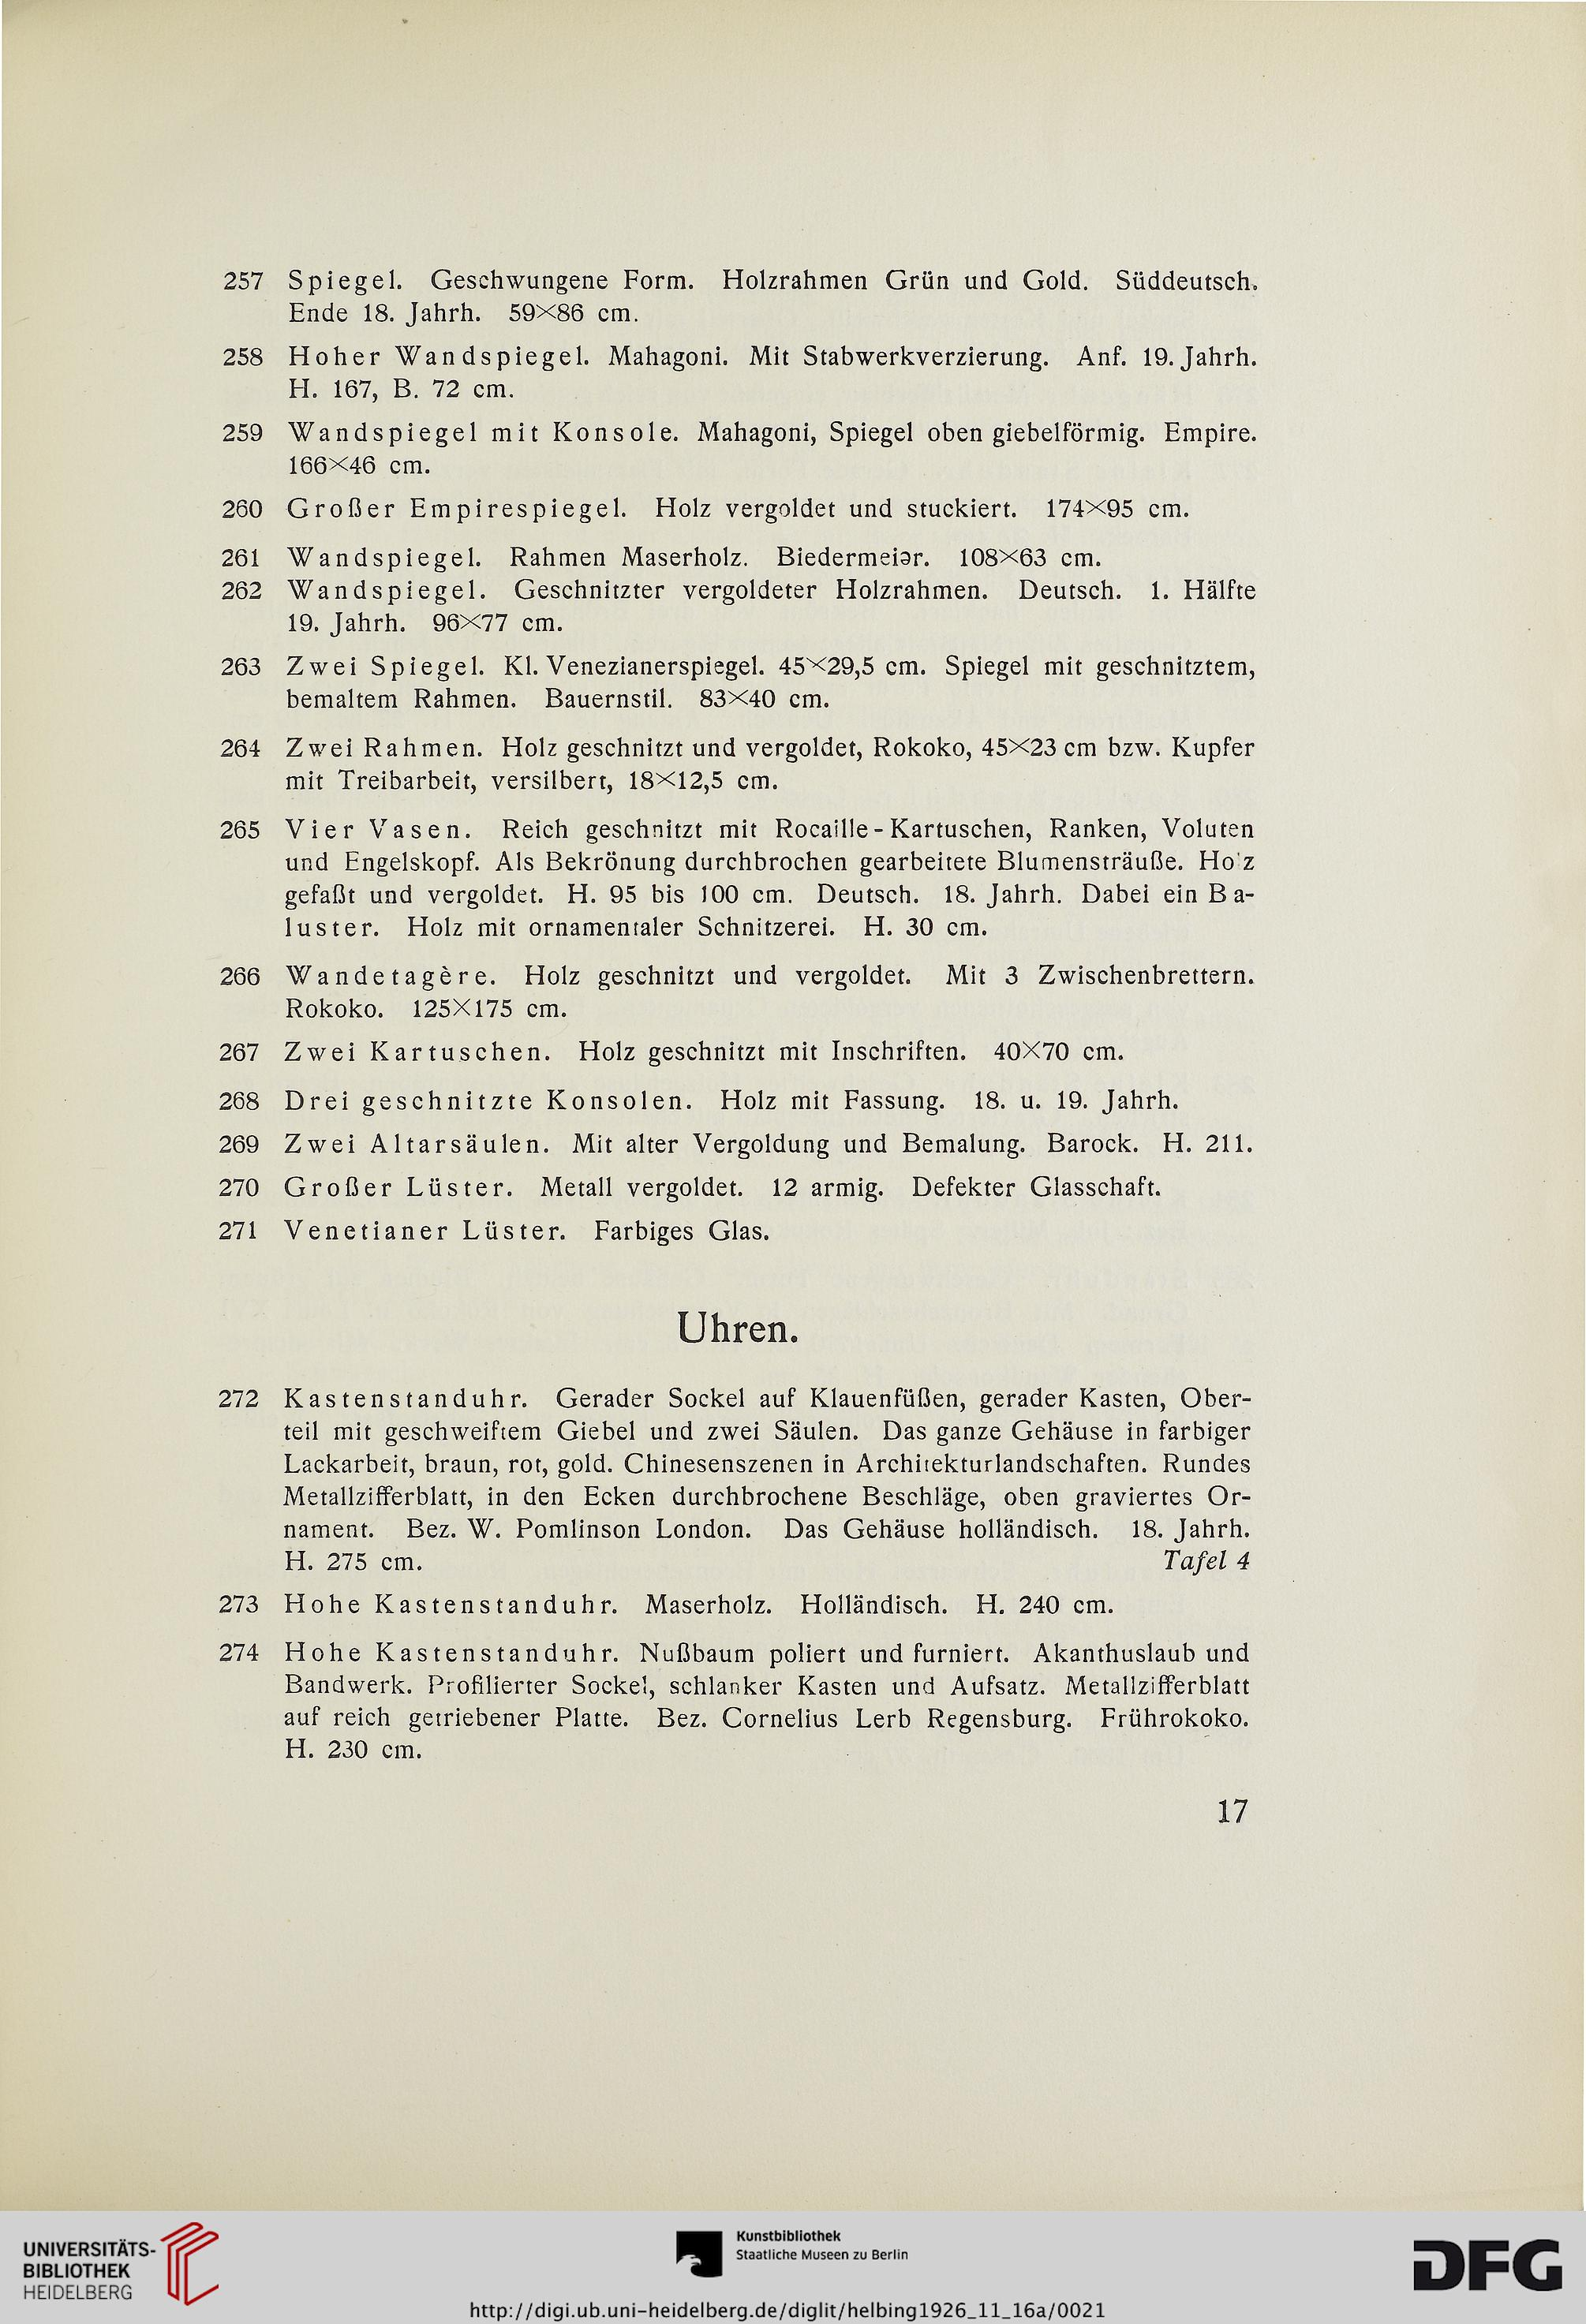 Hugo Helbing <München> [Hrsg.]: Antiquitäten, Keramik, Uhren, Möbel ...